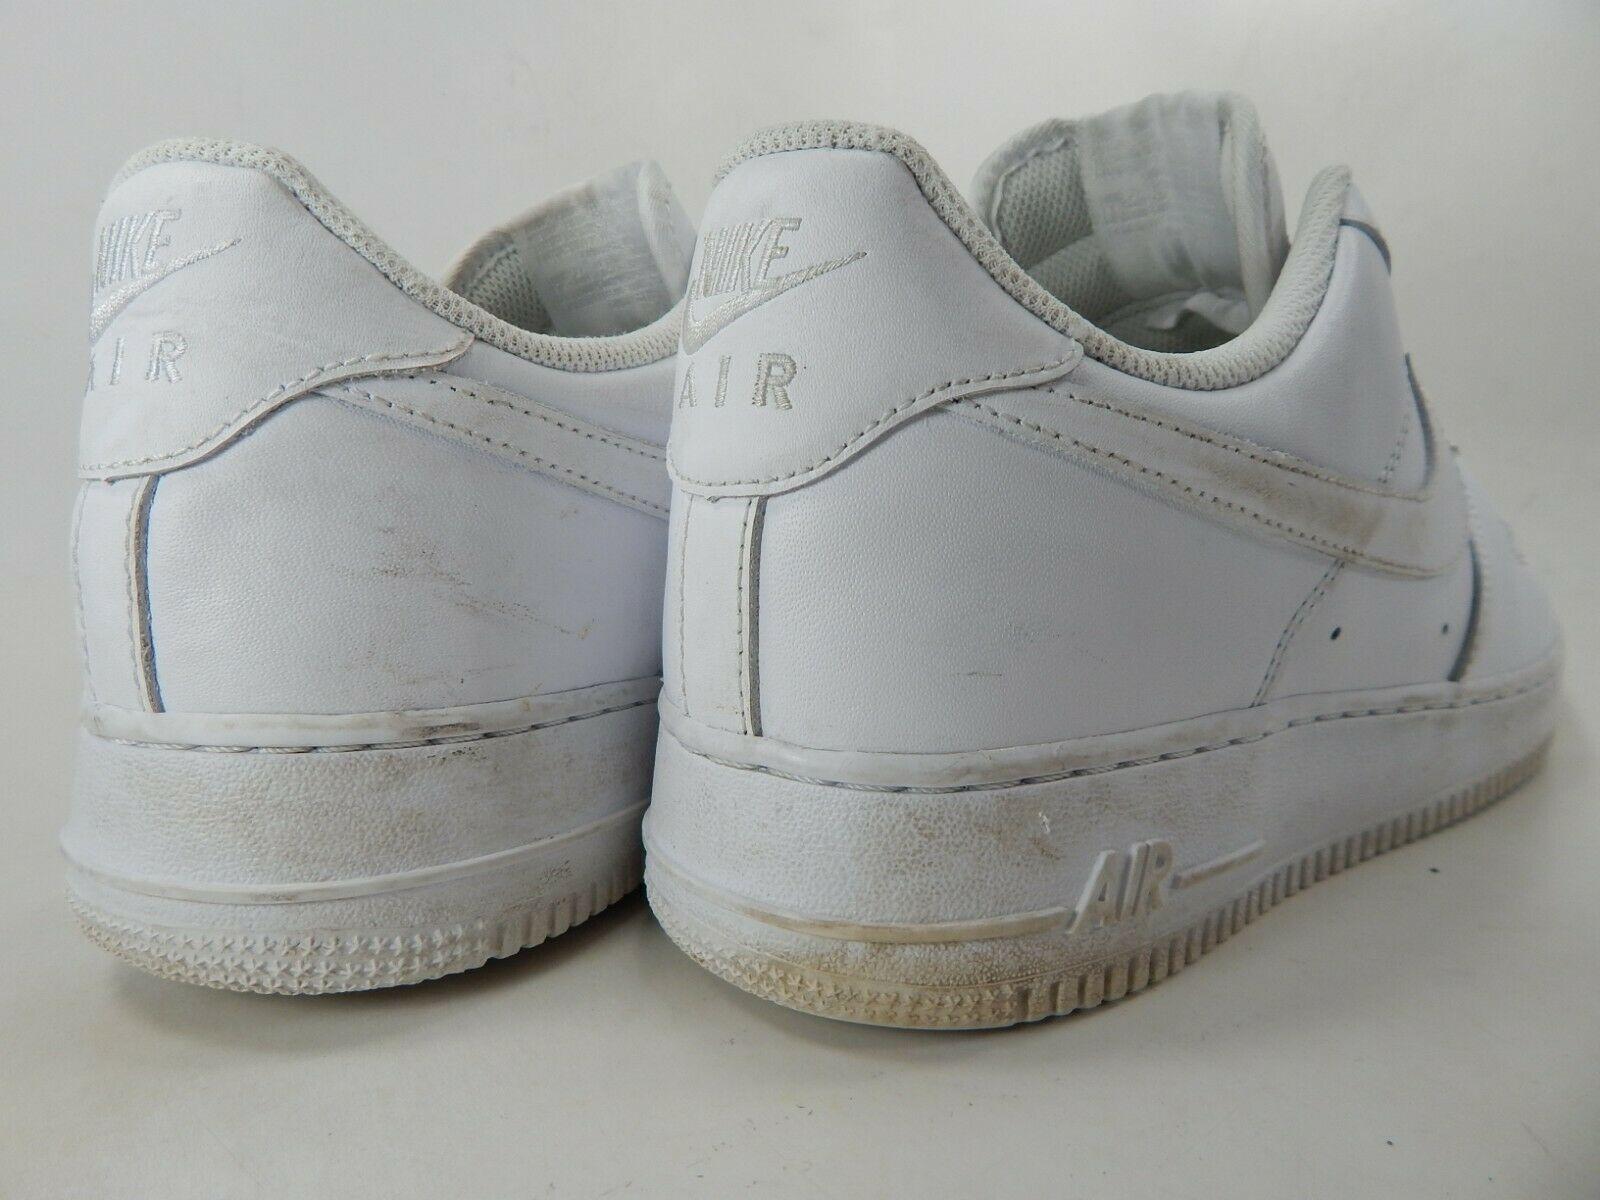 Nike Air Force 1 '07 Size 10.5 M (D) EU 44.5 Men's Sneakers Shoes 315122-111